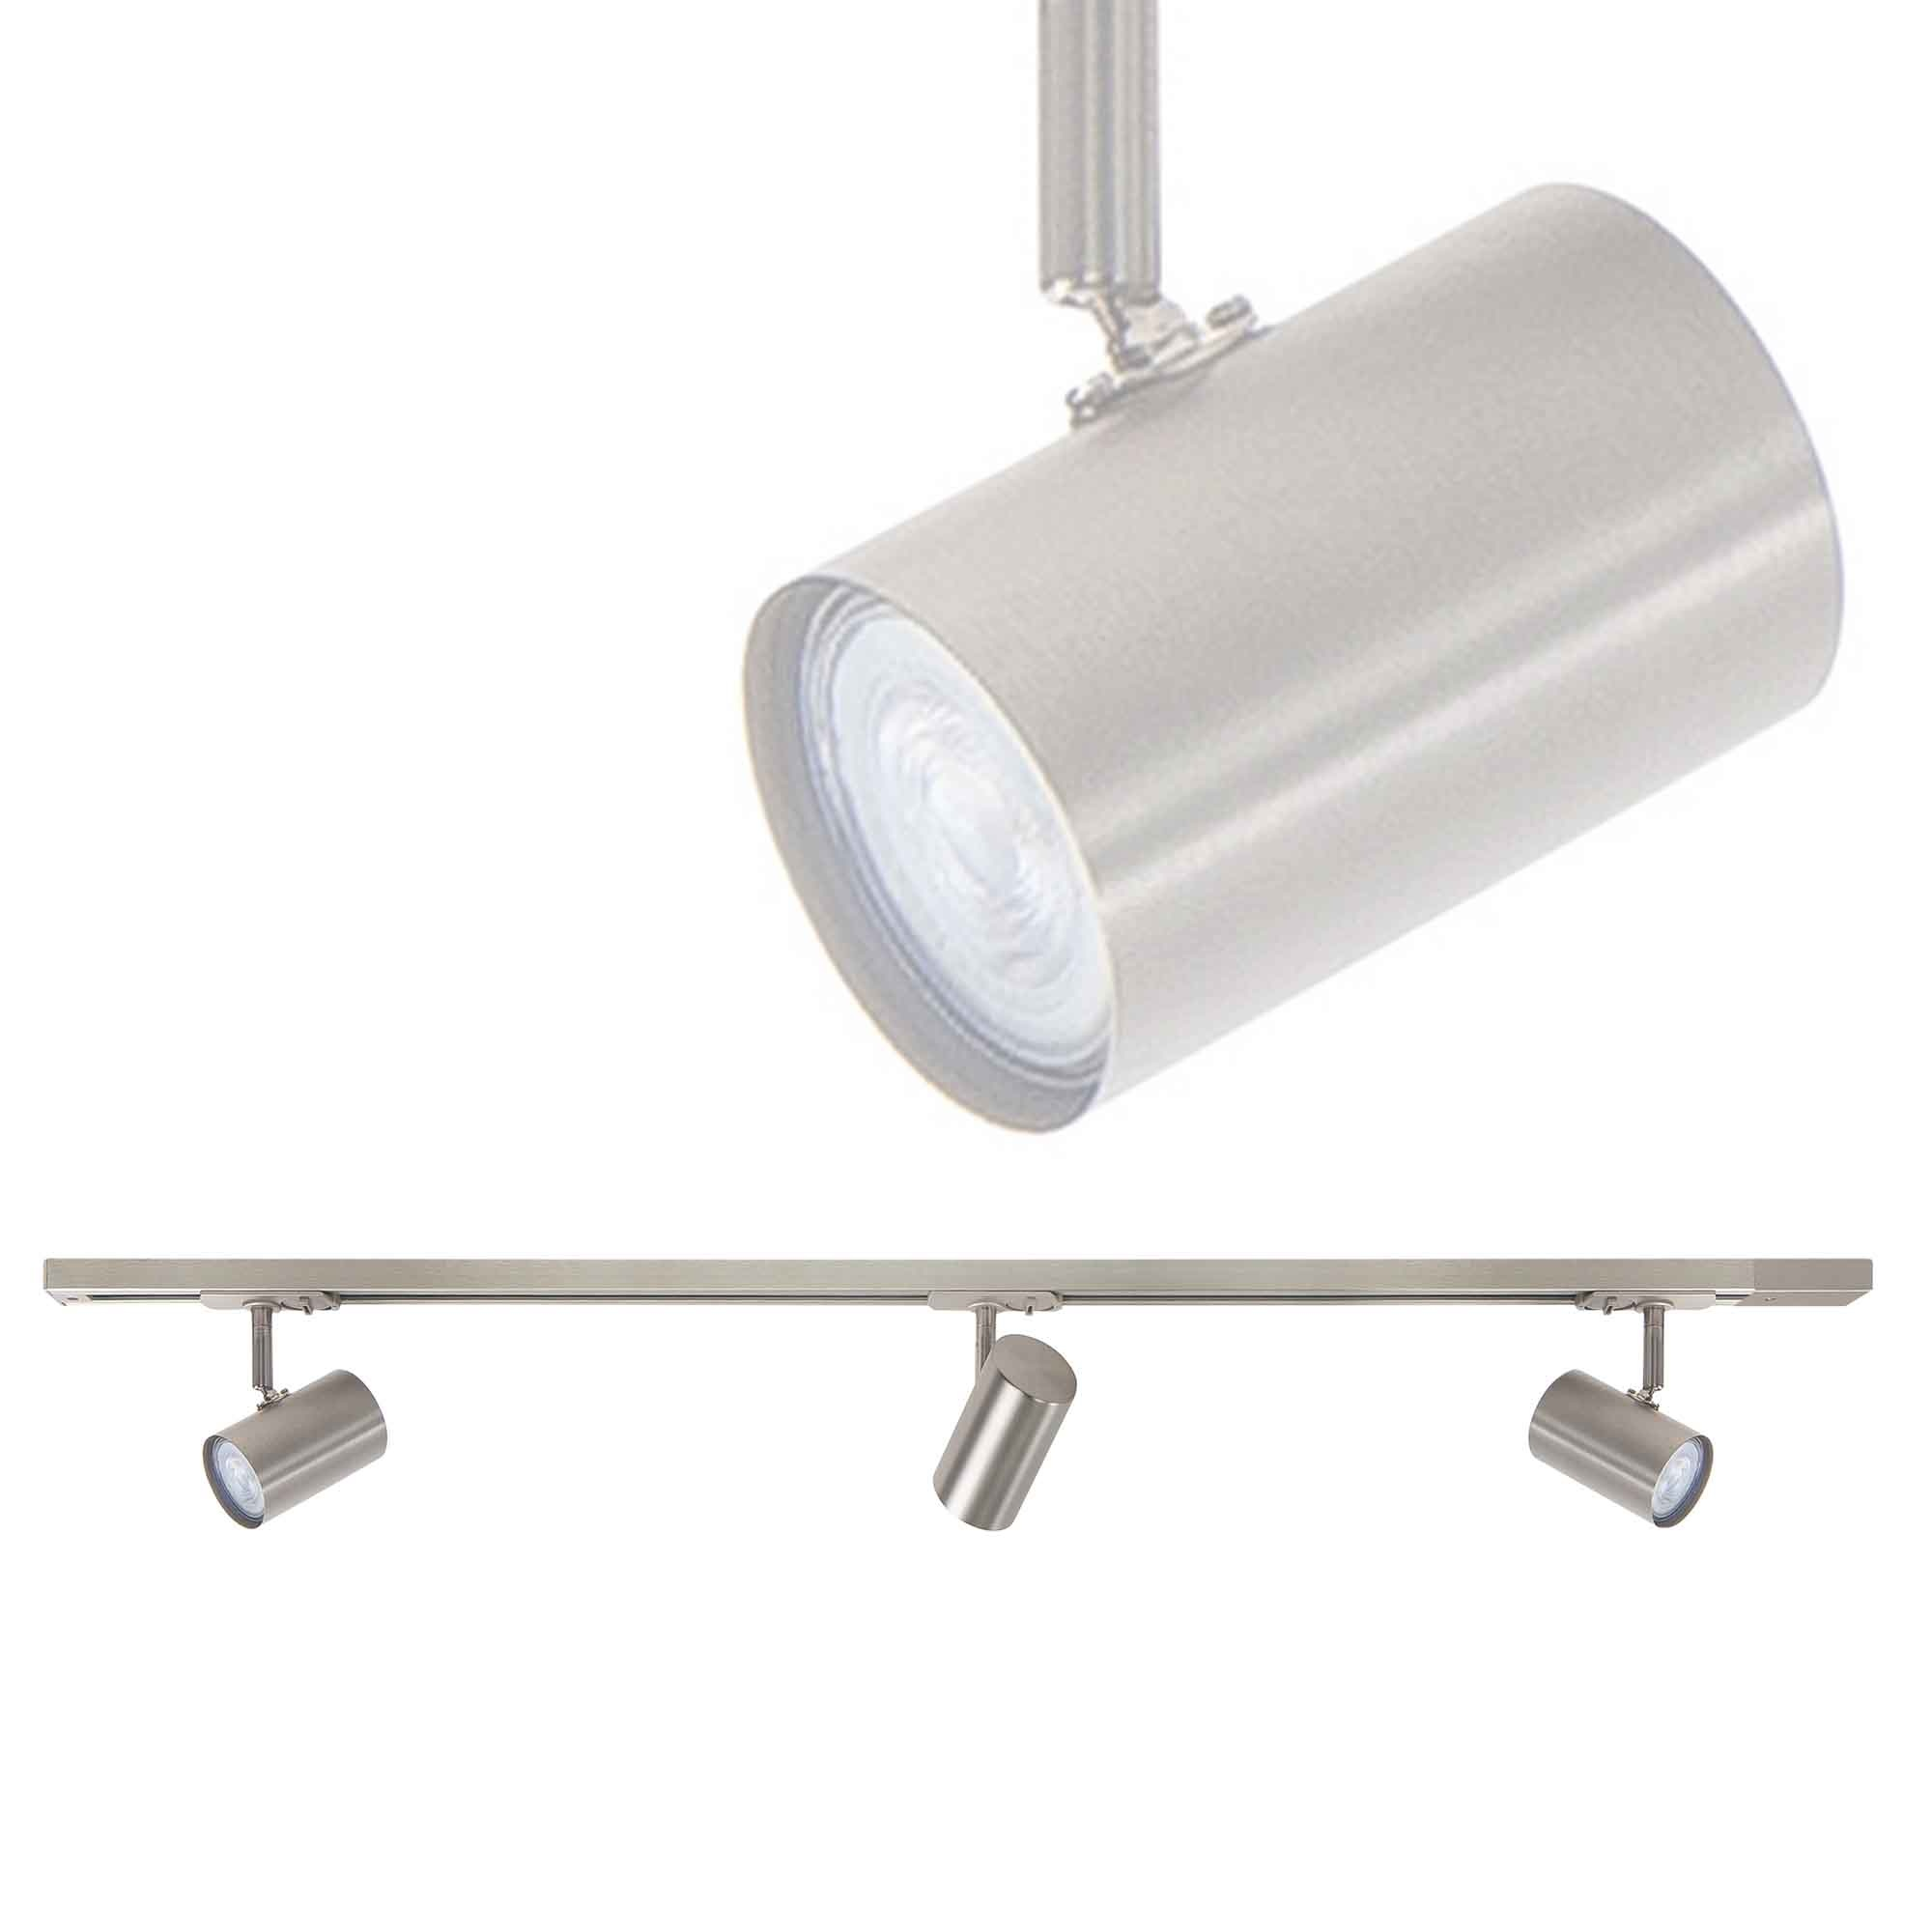 Highlight Railsysteem Trackline 100 cm + 3 cilinder spots mat chroom